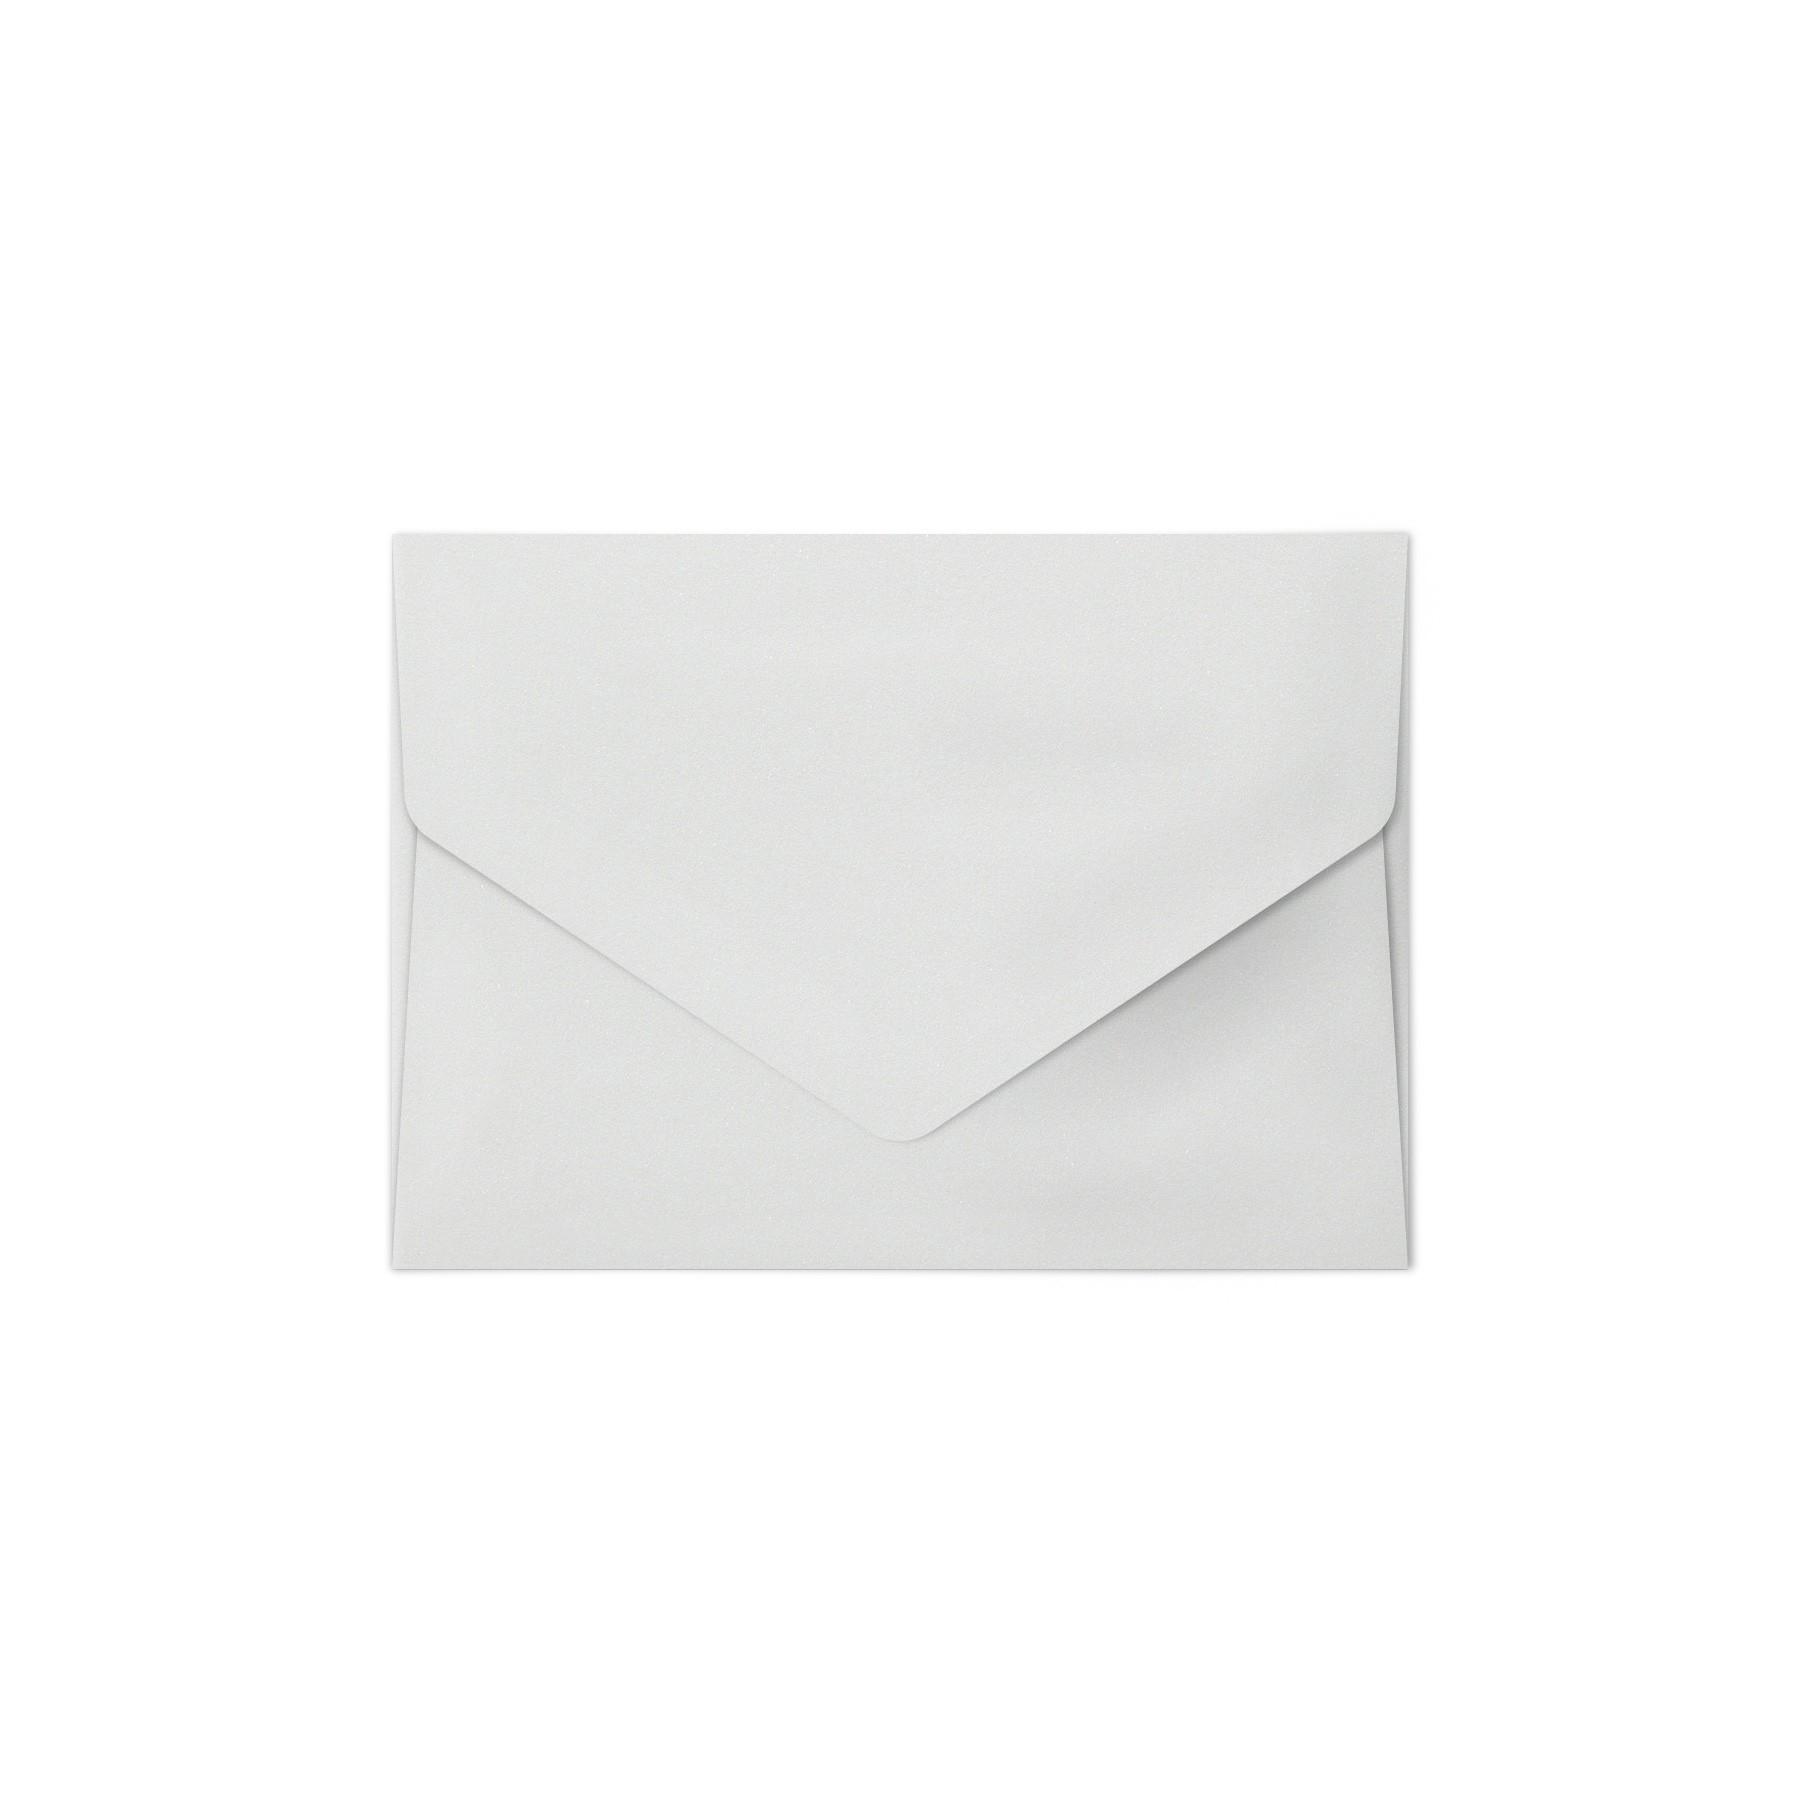 Plic I8 White Silver Sidefat